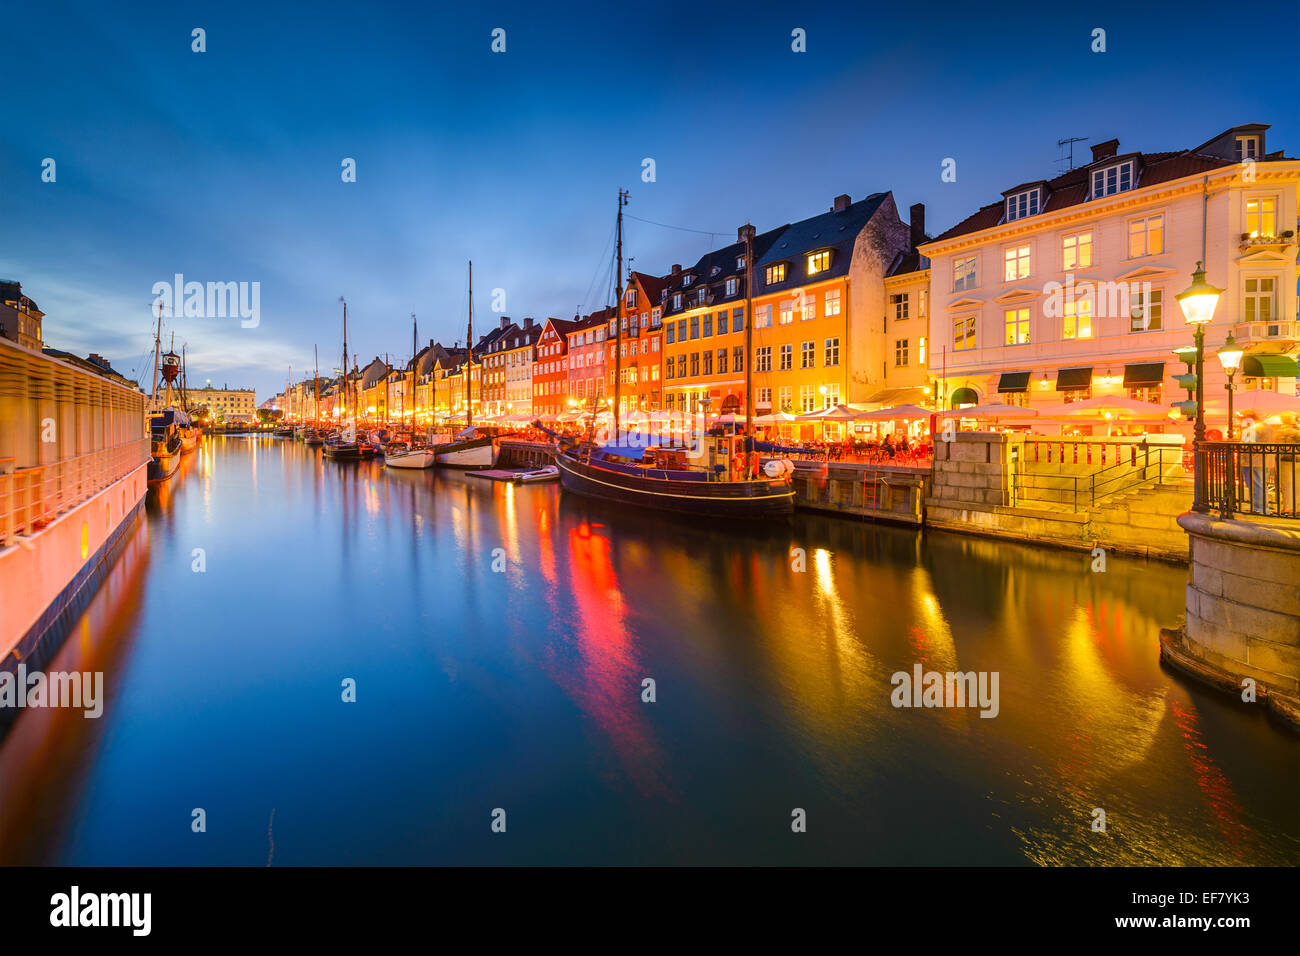 Copenhague, Dinamarca, en el Canal de Nyhavn. Foto de stock